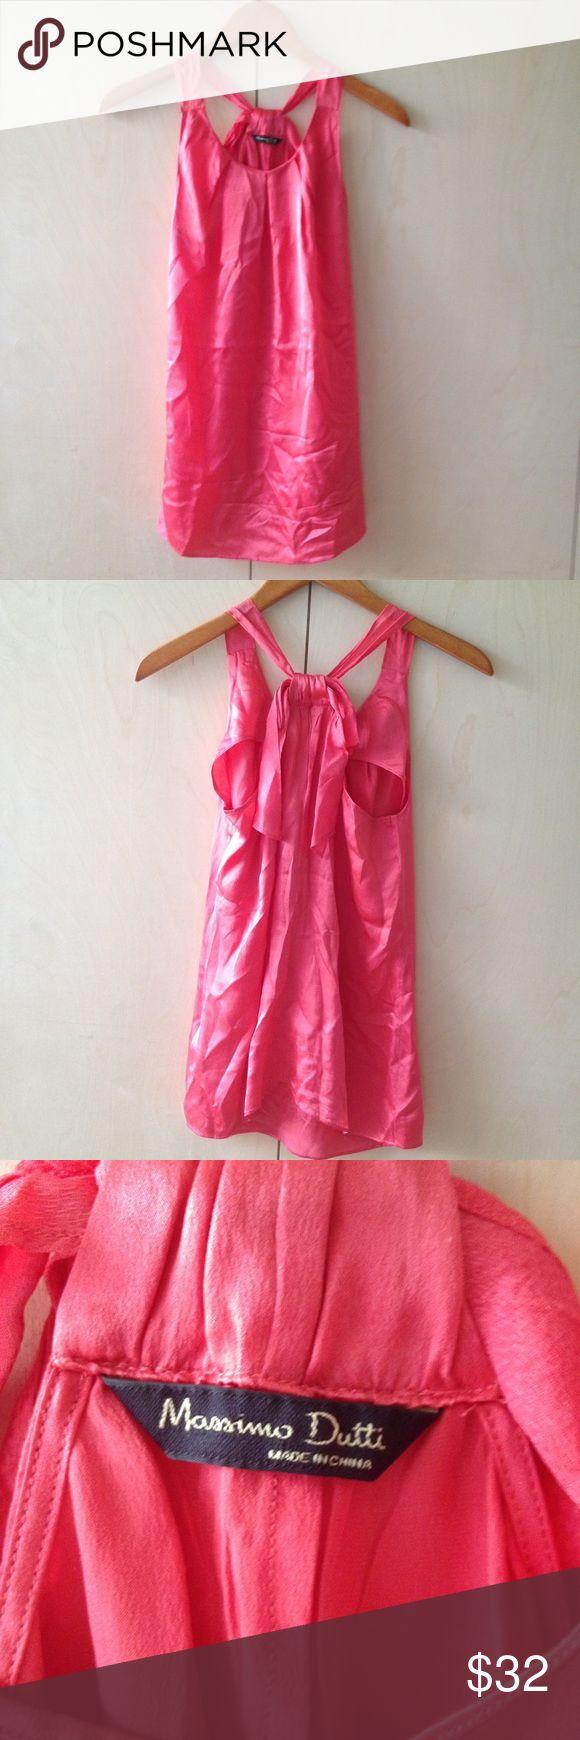 Massimo Dutti hot pink salmon 100% silk halter XS Massimo Dutti hot pink salmon 100% mulberry silk halter XS Massimo Dutti Tops Blouses